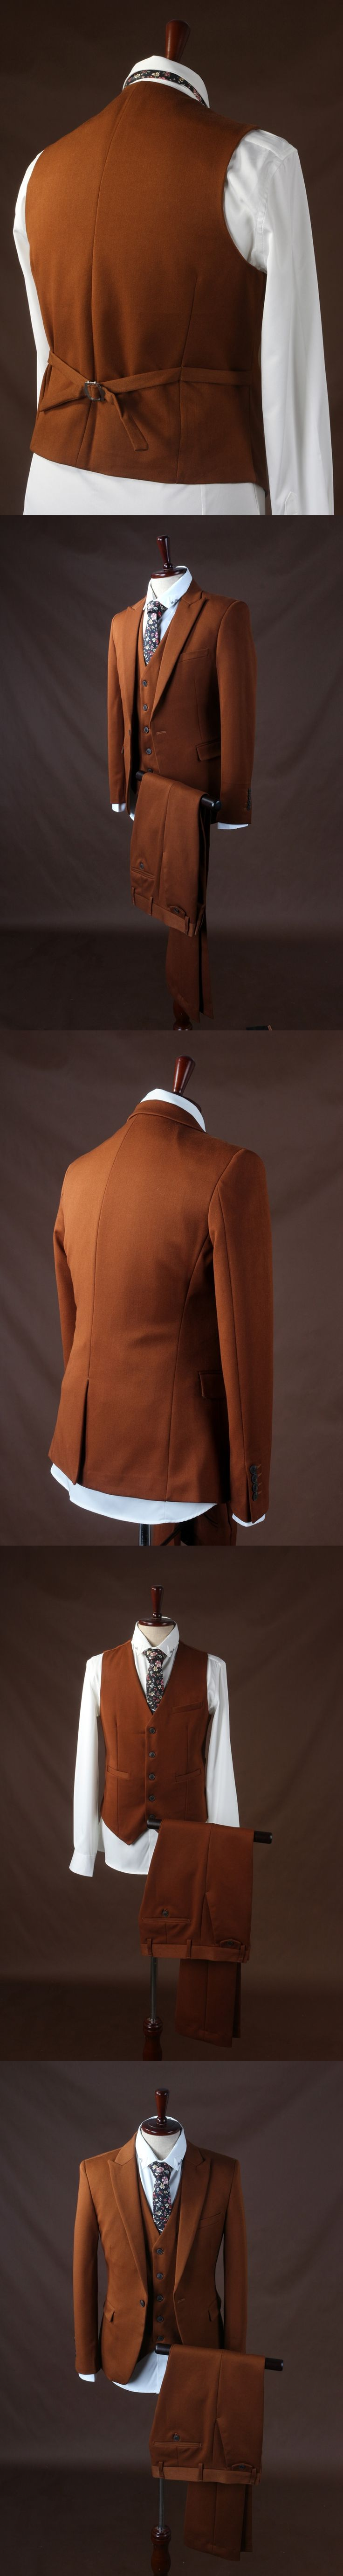 2017 Latest Coat Pant Designs Dark Brown Wedding Suits For Men Groom Slim Fit 3 Piece Tuxedo Custom Prom Blazer Terno Masuclino